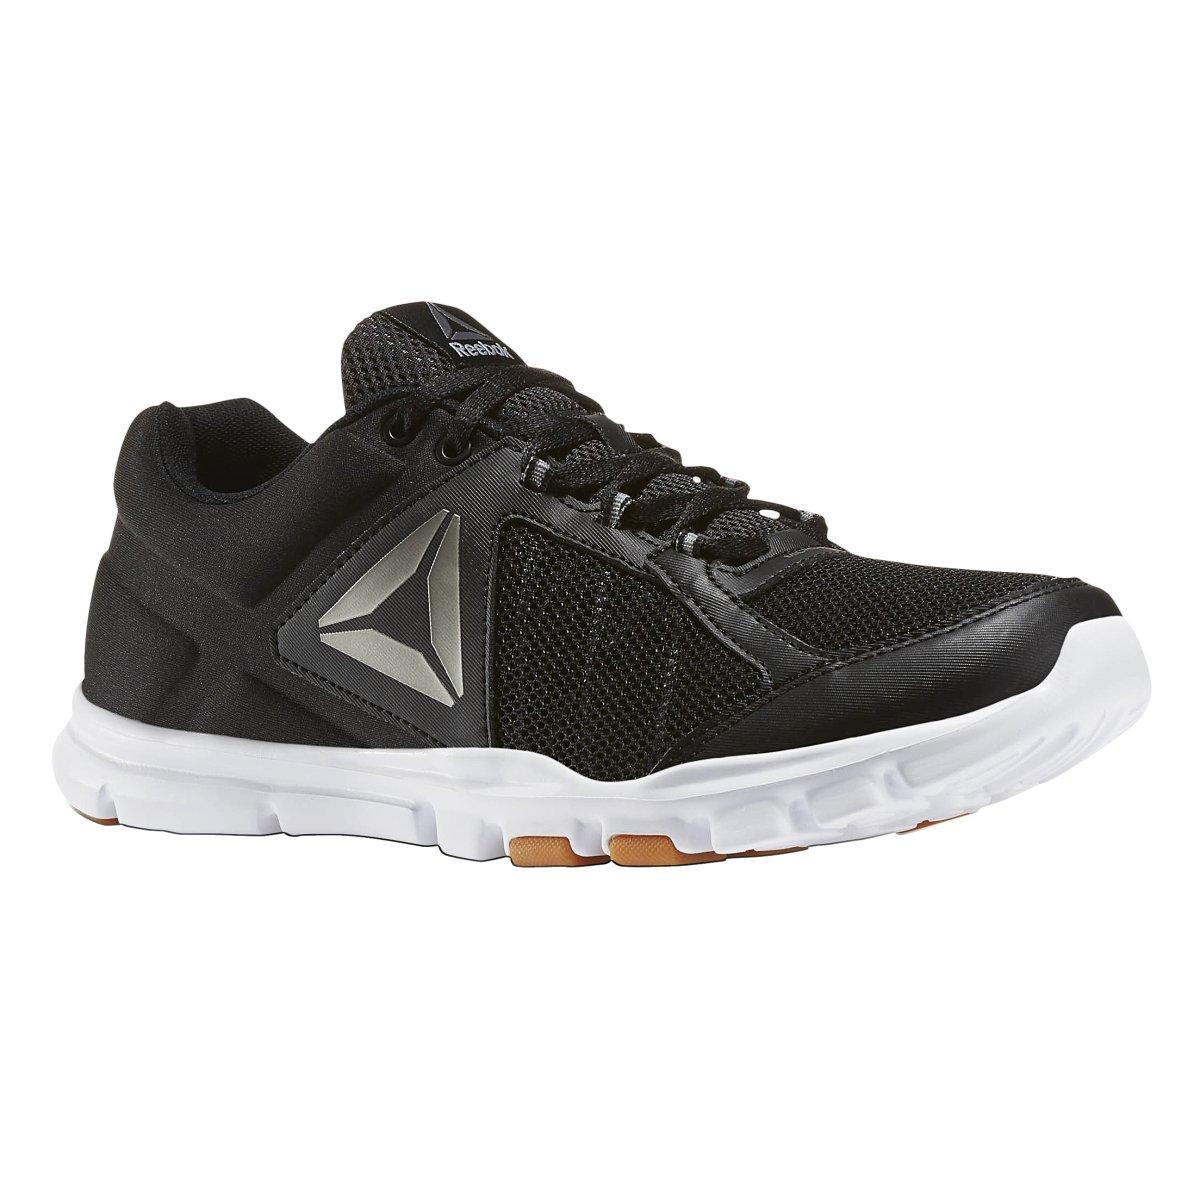 Reebok Men's Yourflex Train 9.0 MT Cross-Trainer Shoe, Black//White/Gum/Pewter, 10 M US